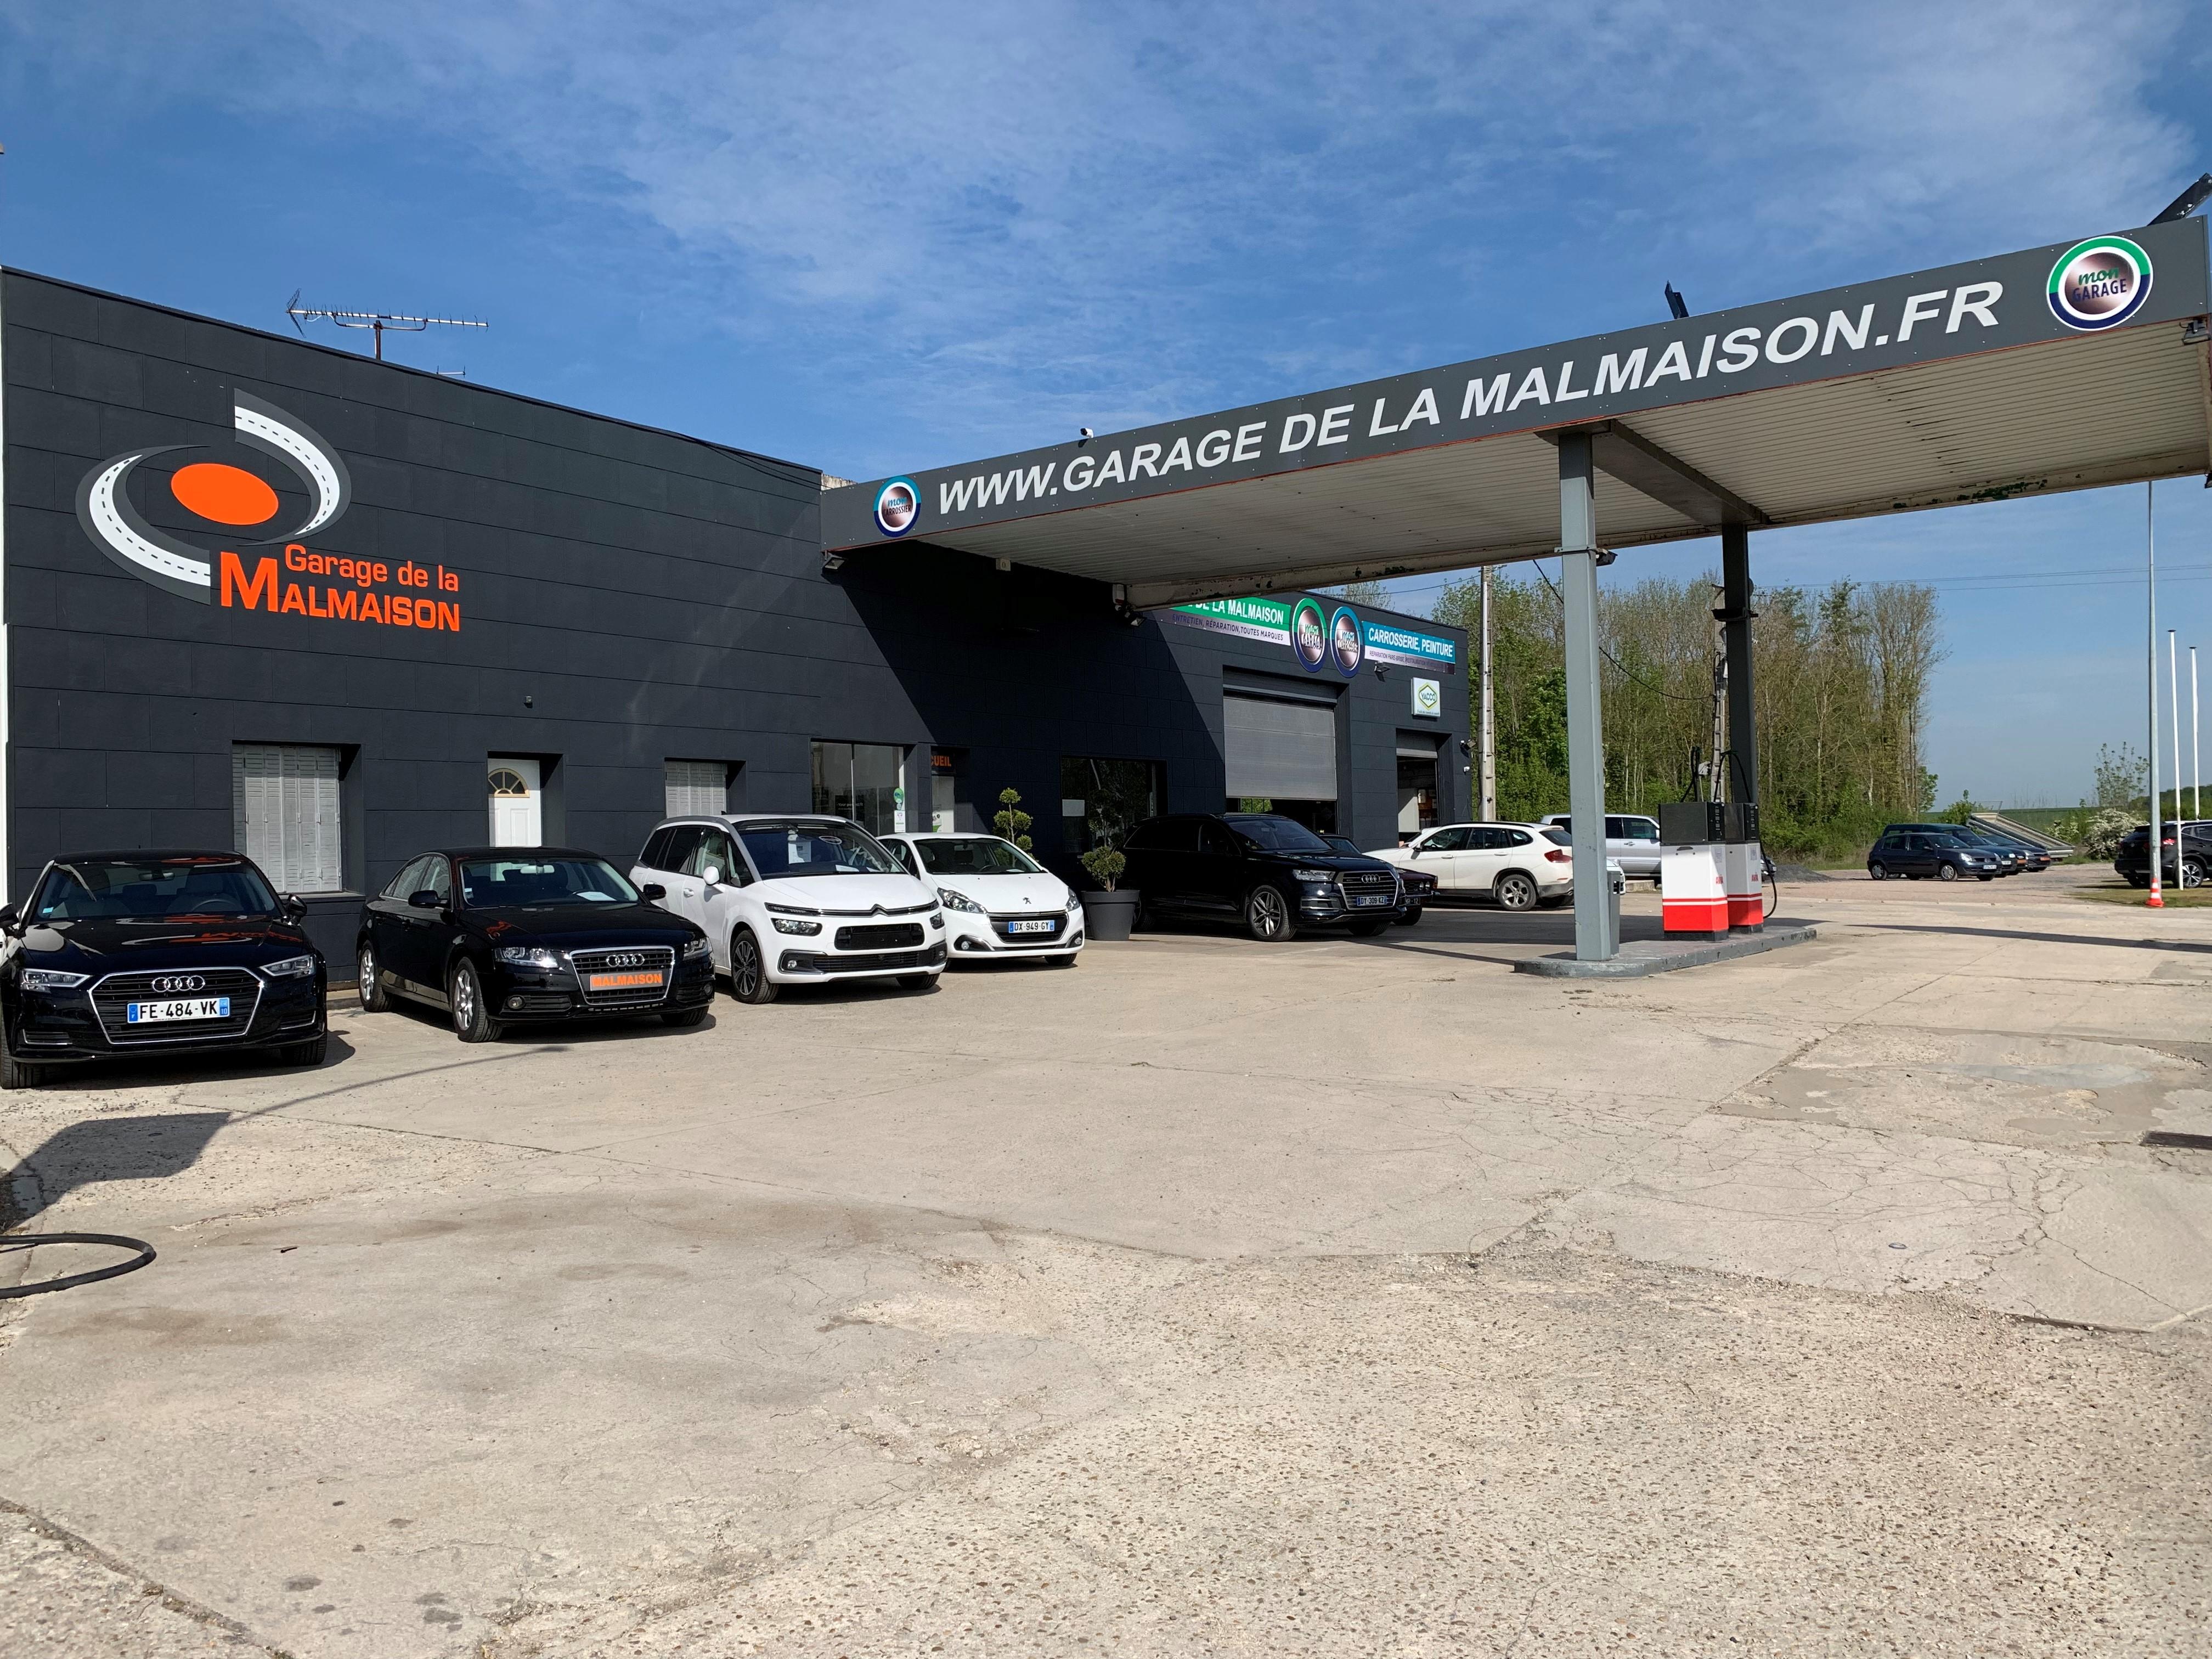 Garage de la Malmaison